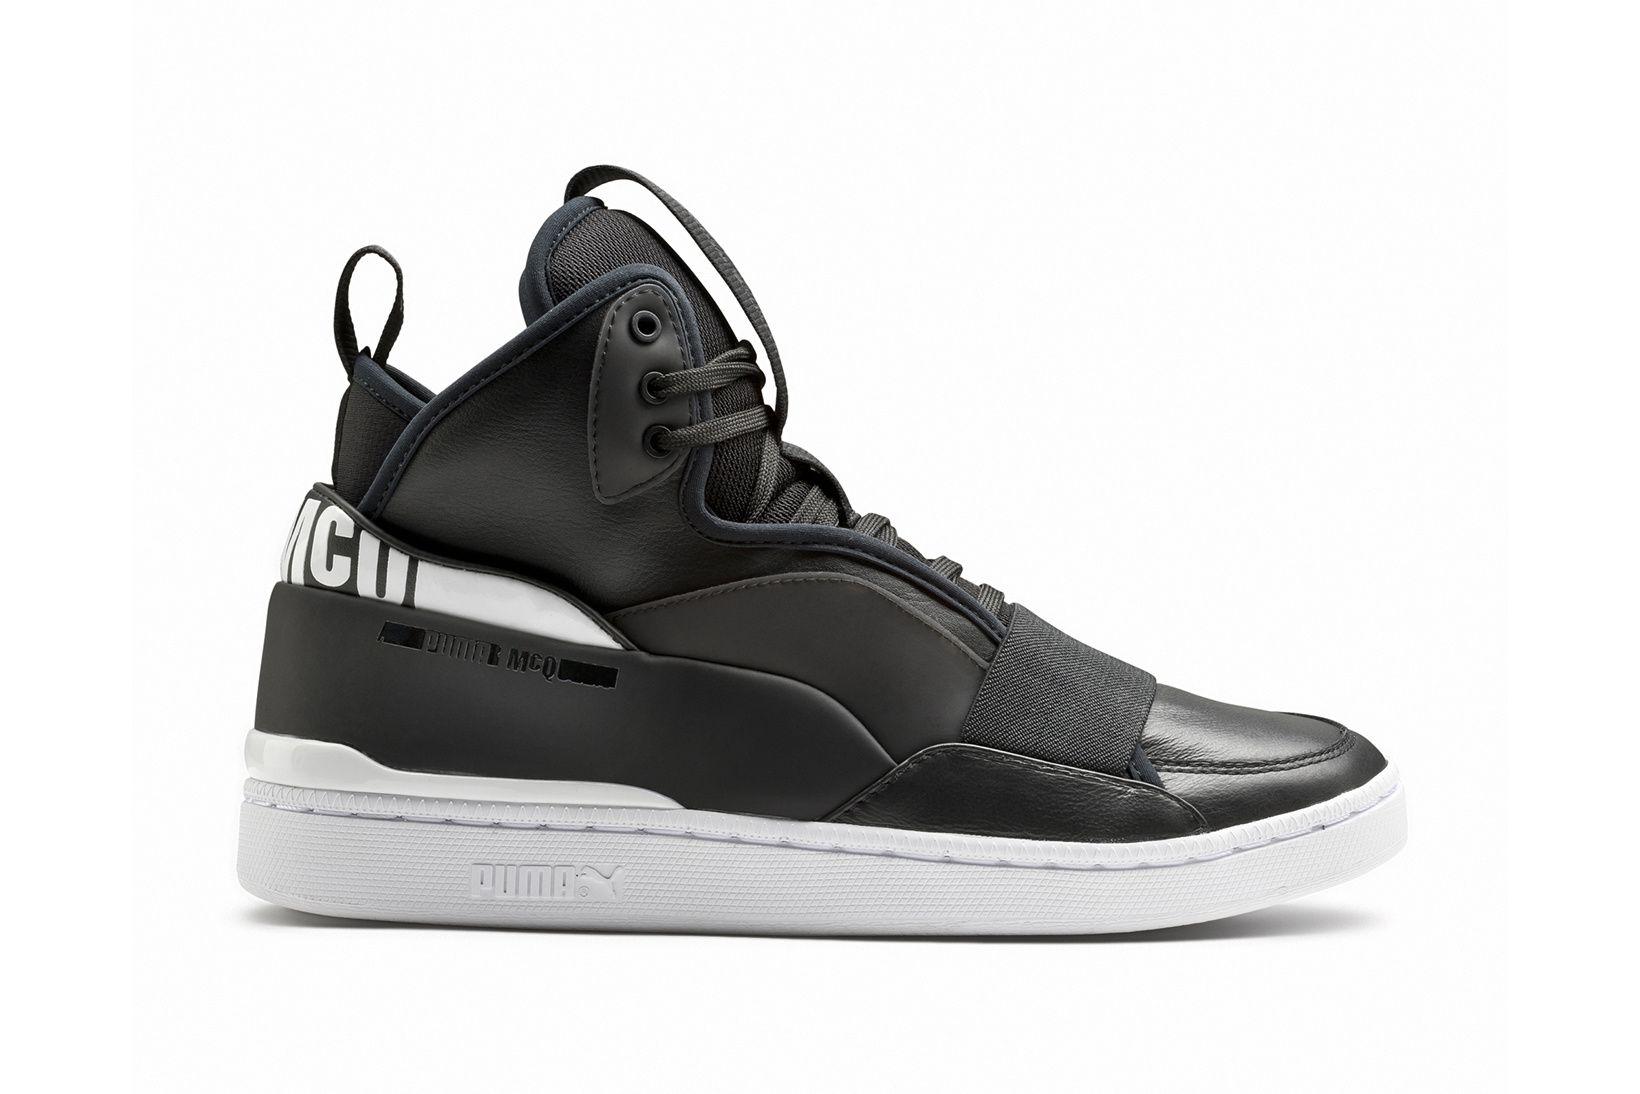 los angeles 02b20 5b677 Nike Sportswear Air Flow TZ Tonal Pack (Olive) Foot Fetish Pinterest ...